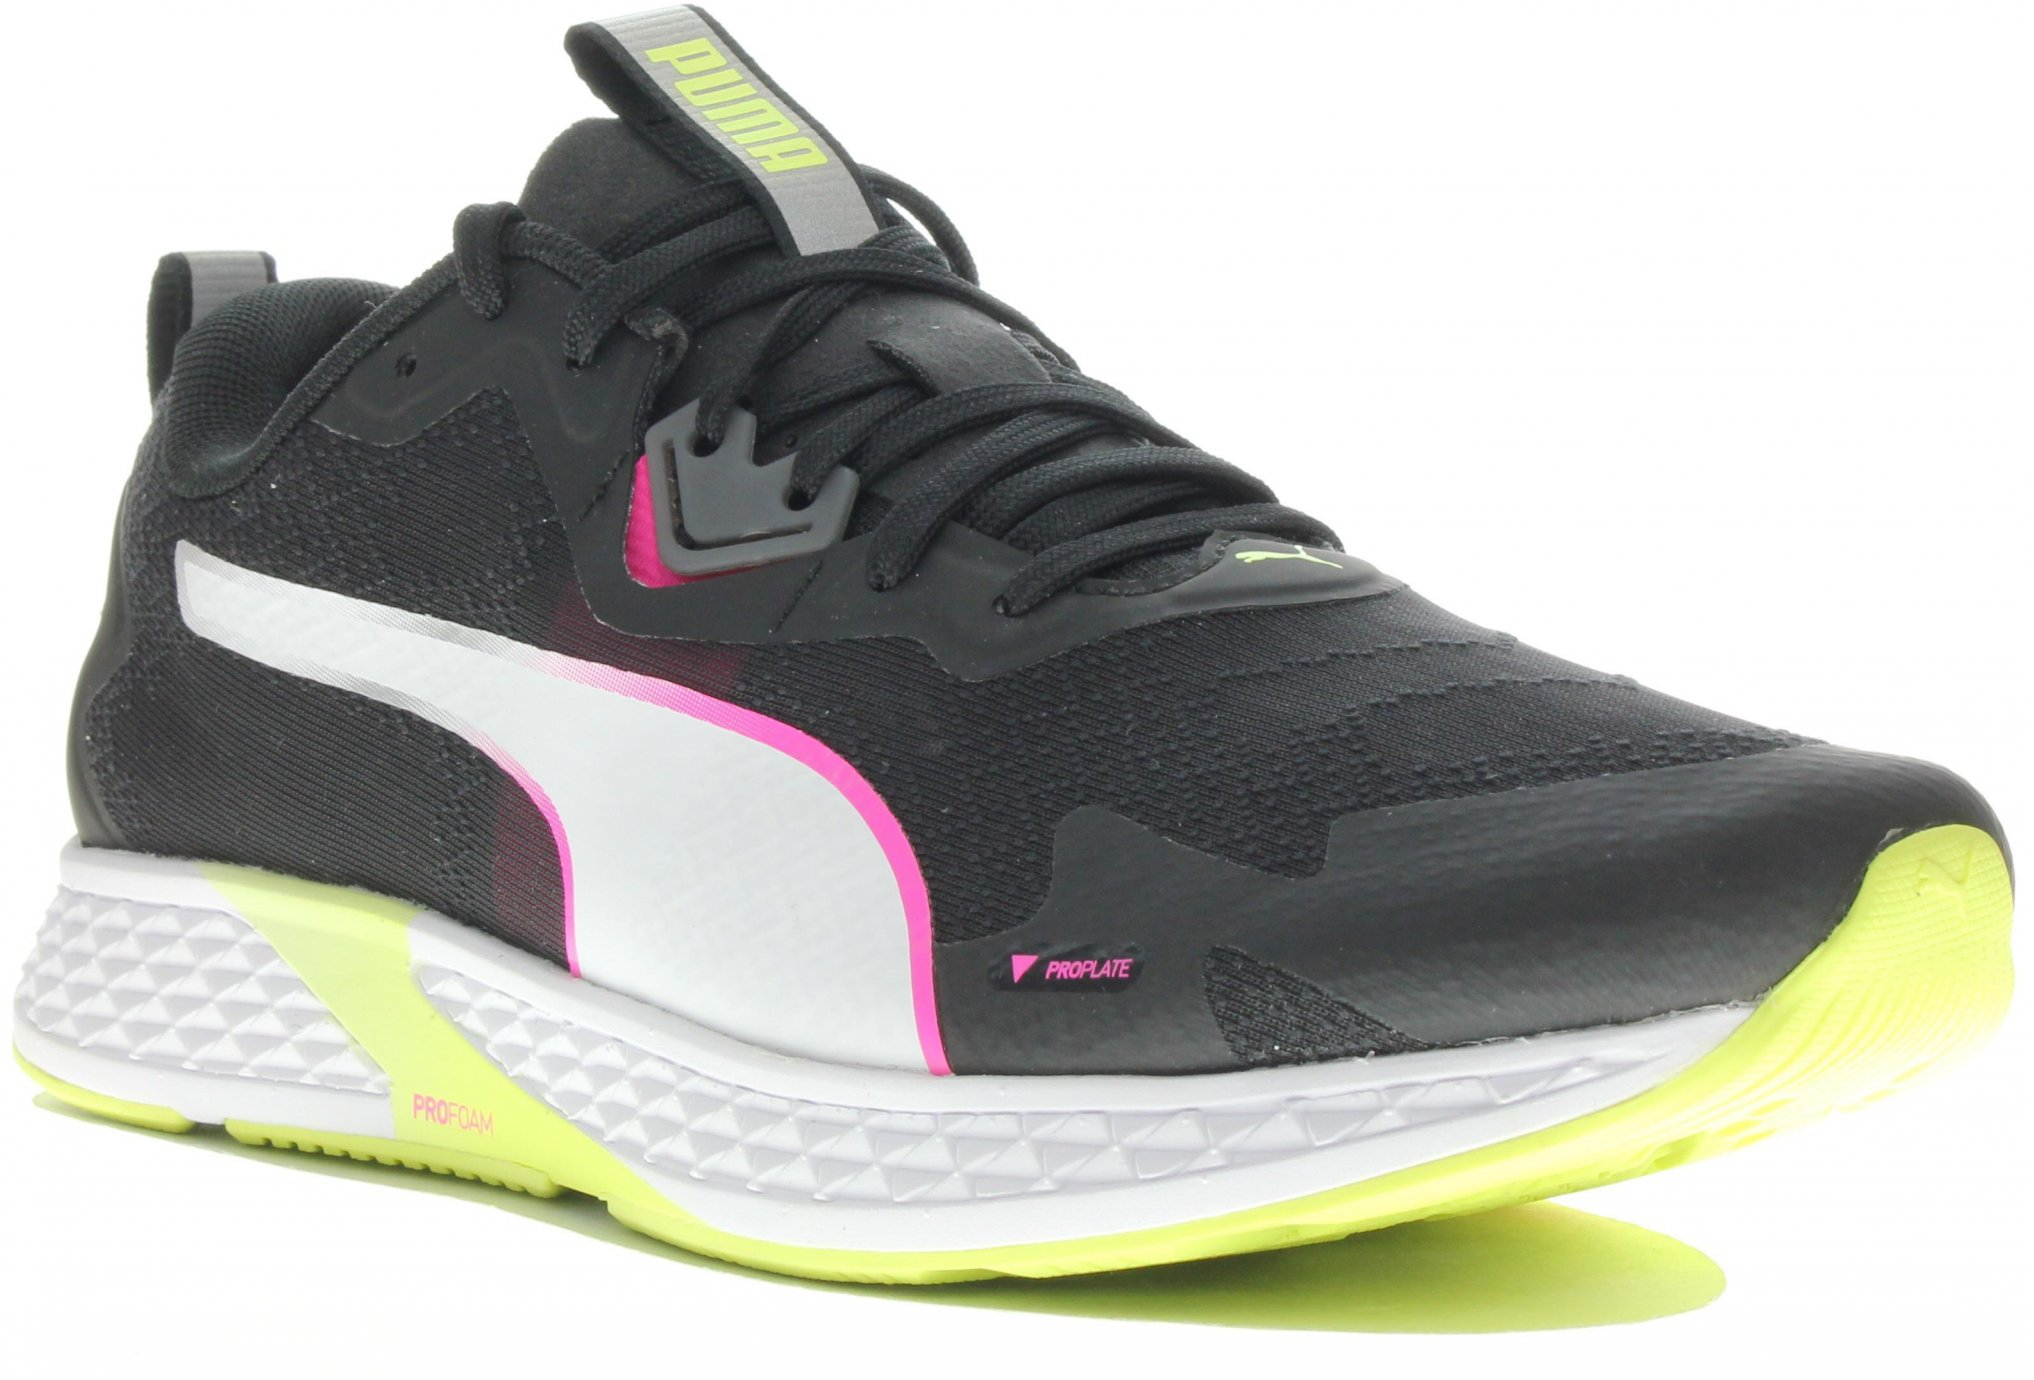 Puma Speed 500 2 W Diététique Chaussures femme